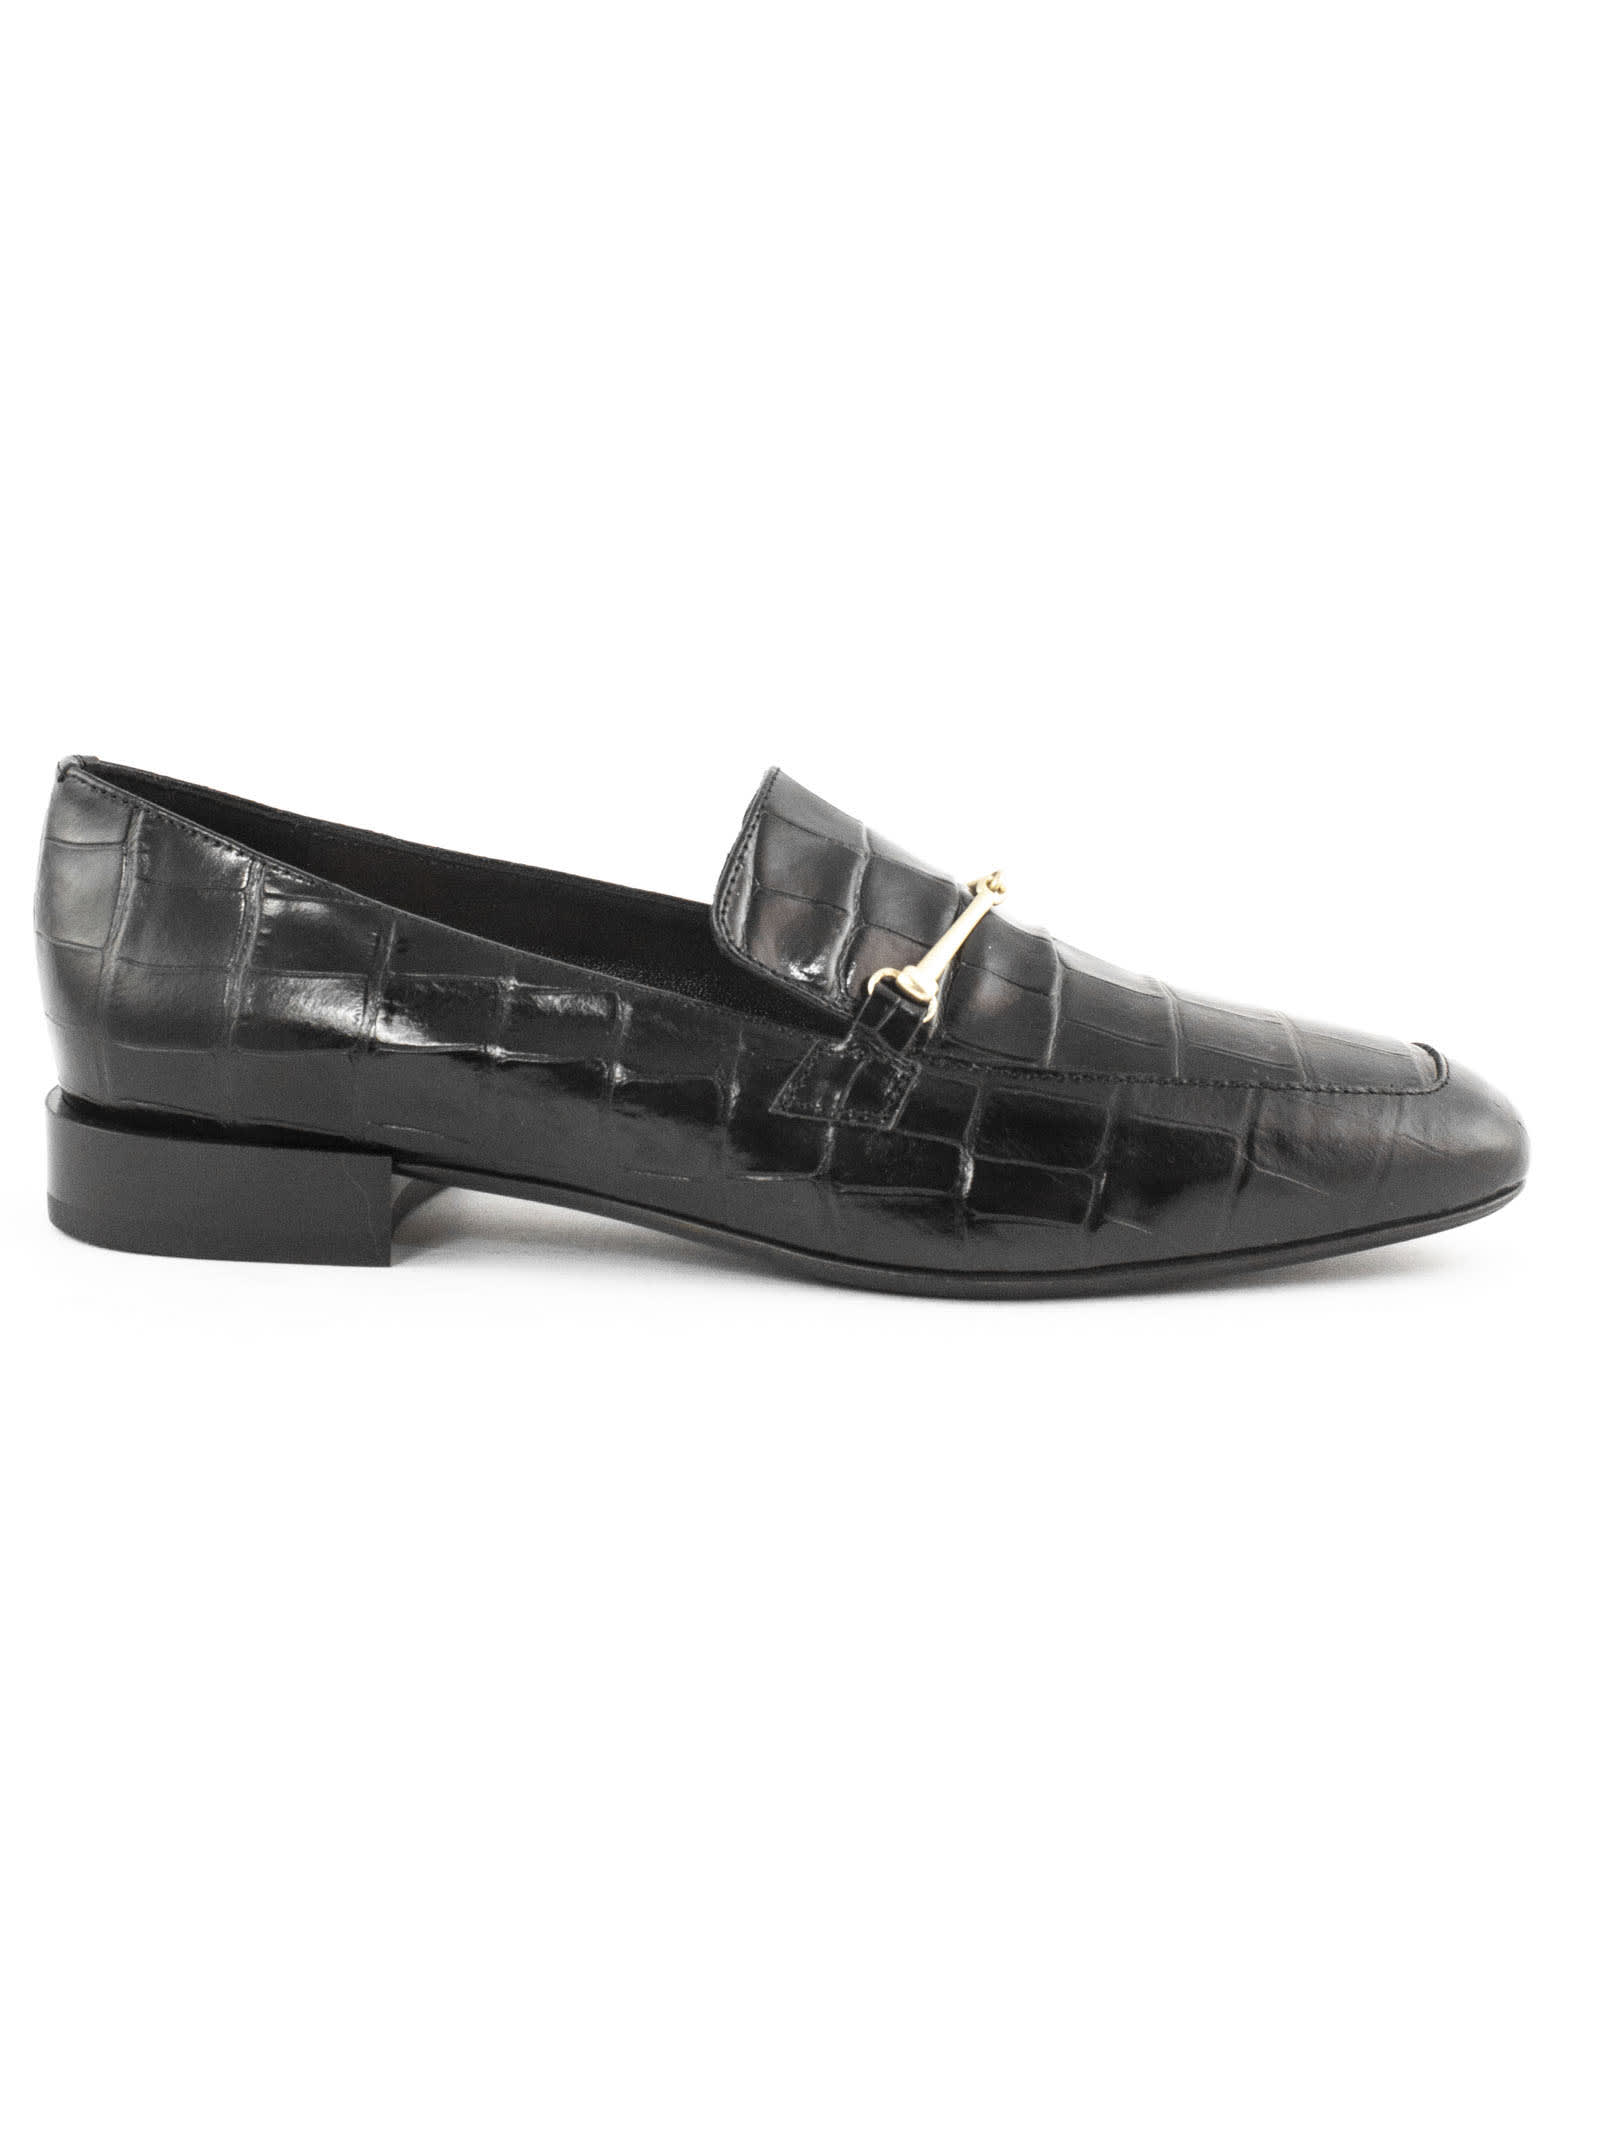 Crocodile Print Black Leather Loafer